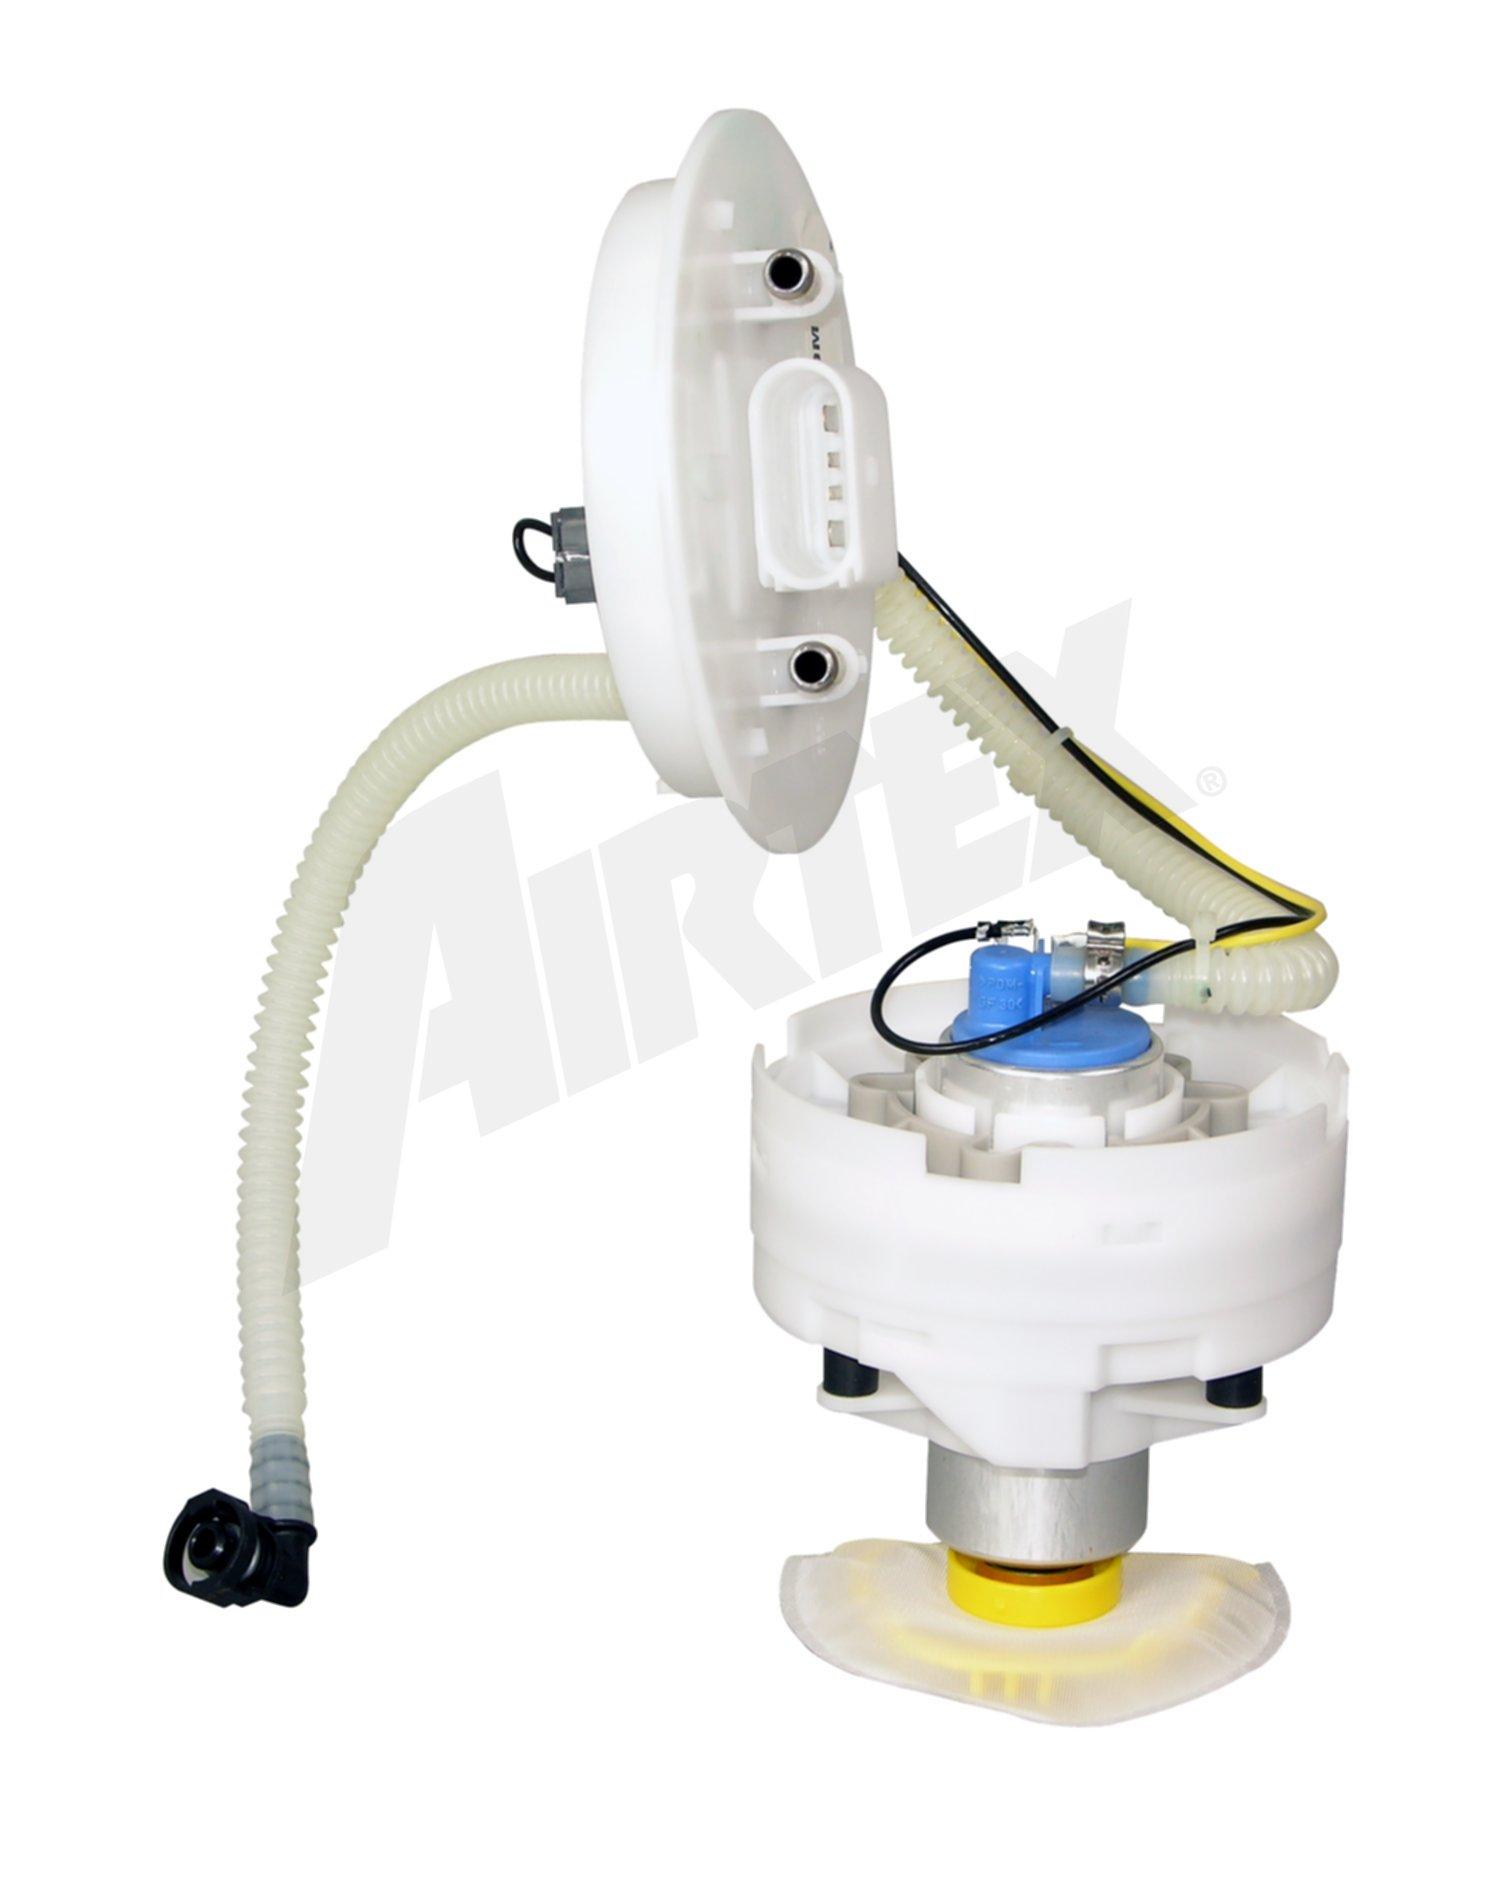 Airtex Fuel Pumps E8560M Fuel Pump Module Assembly Fits 2002-2004 Volkswagen Passat